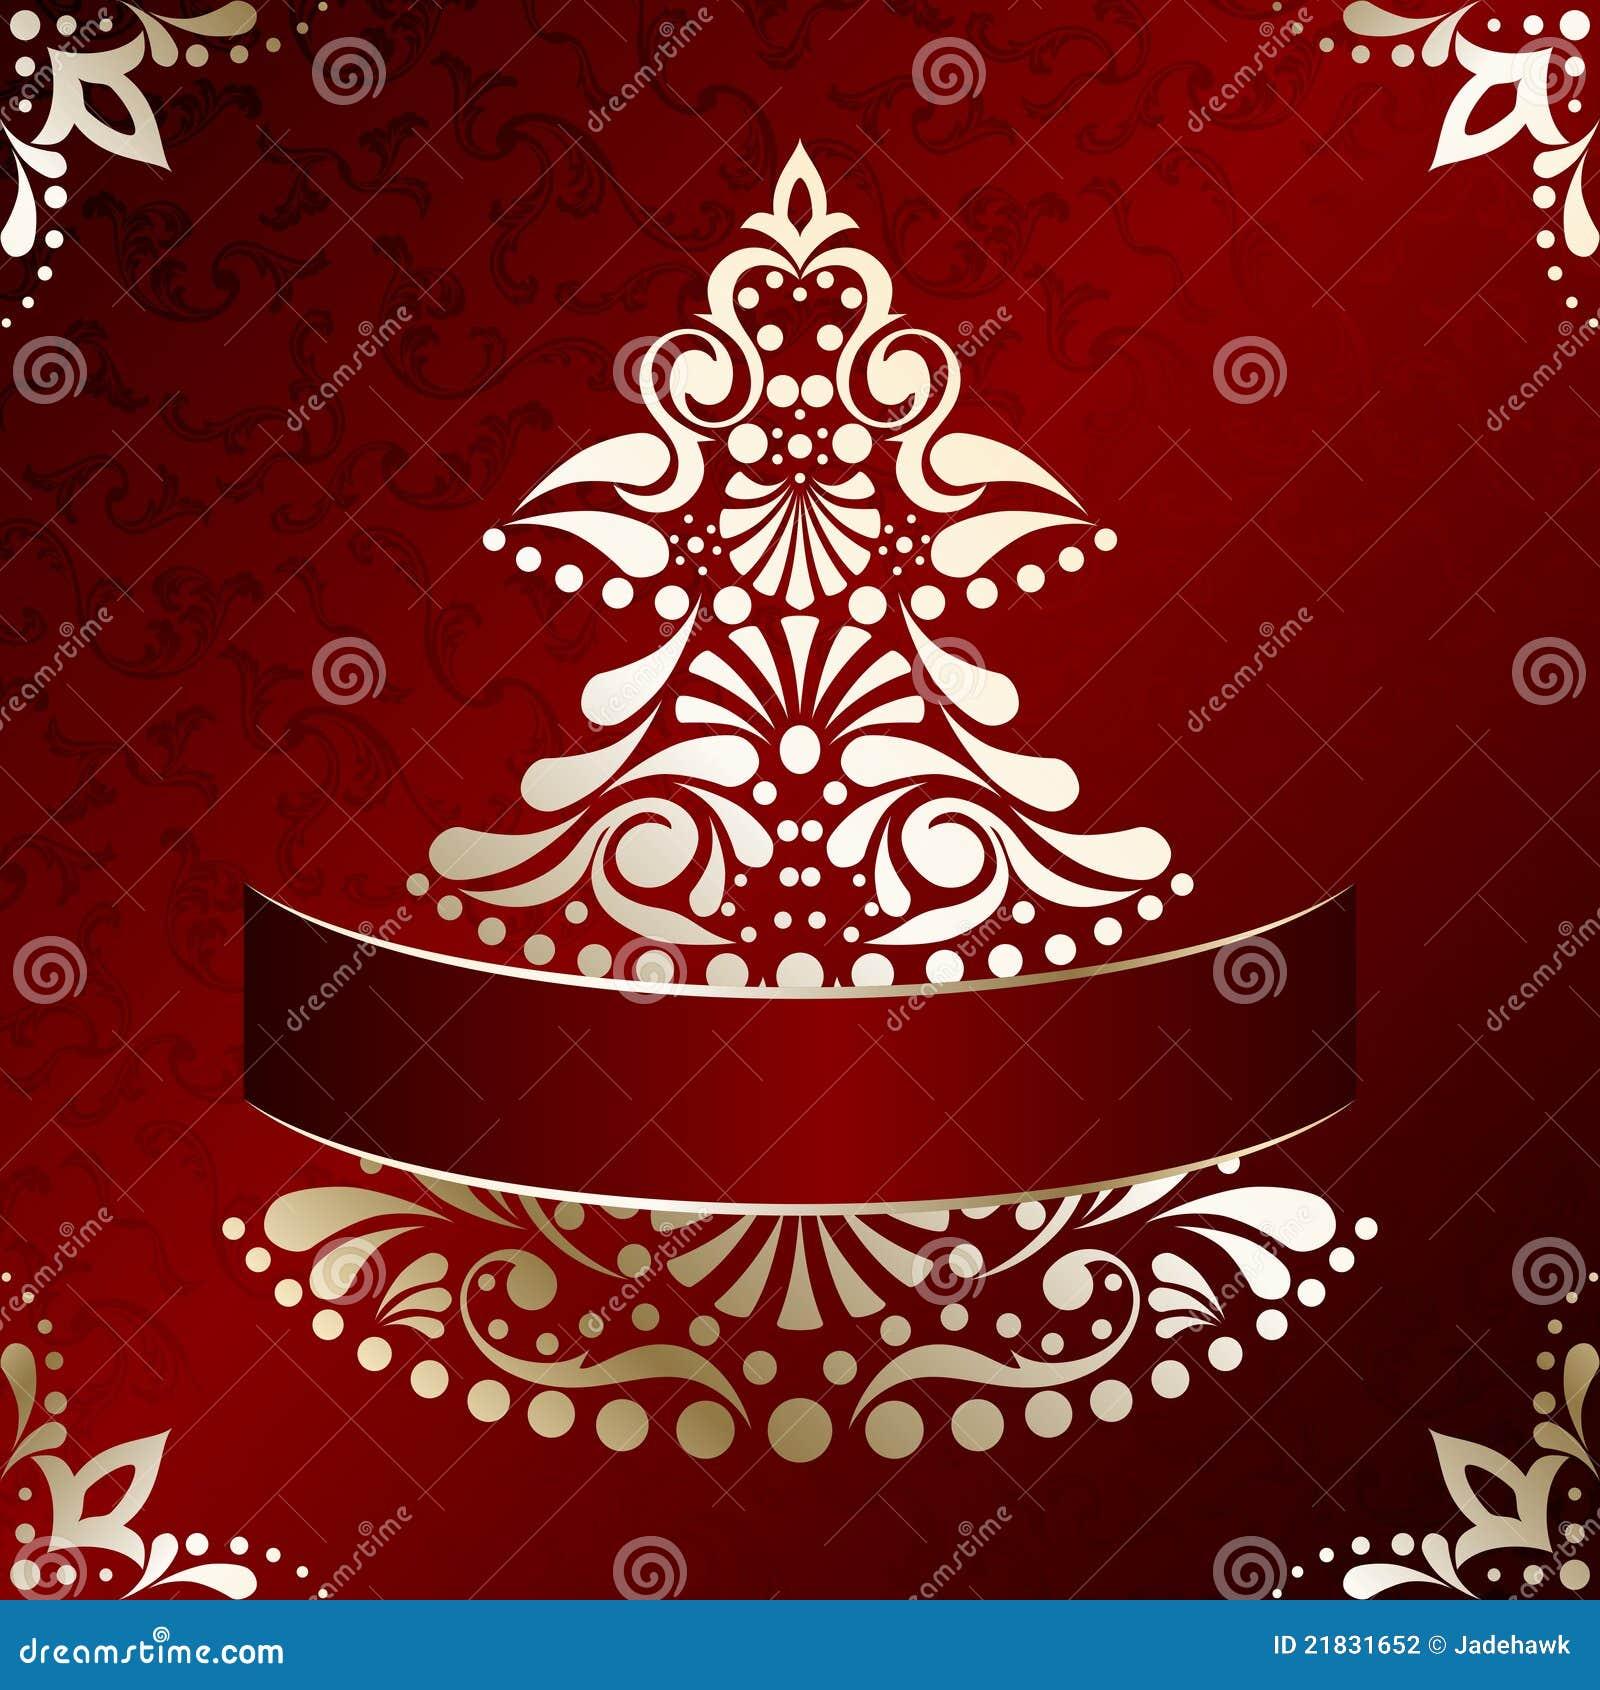 Elegant Christmas Card With Christmas Tree Stock Vector ...